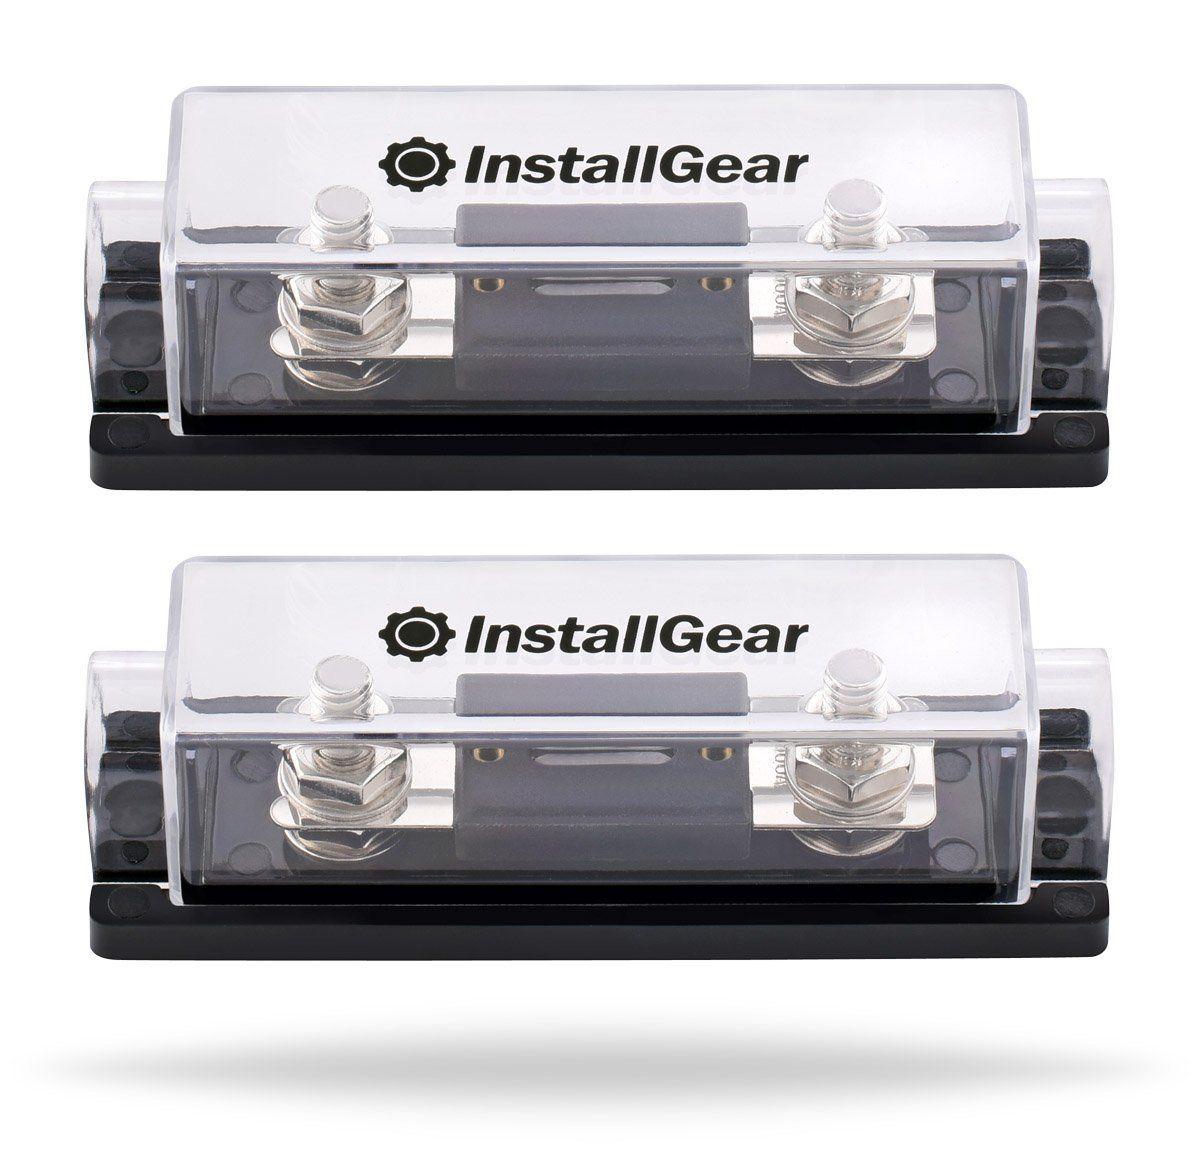 Installgear 0 2 4 Gauge Ga Anl Fuse Holder 100 Amp Fuses Audio Box Pack